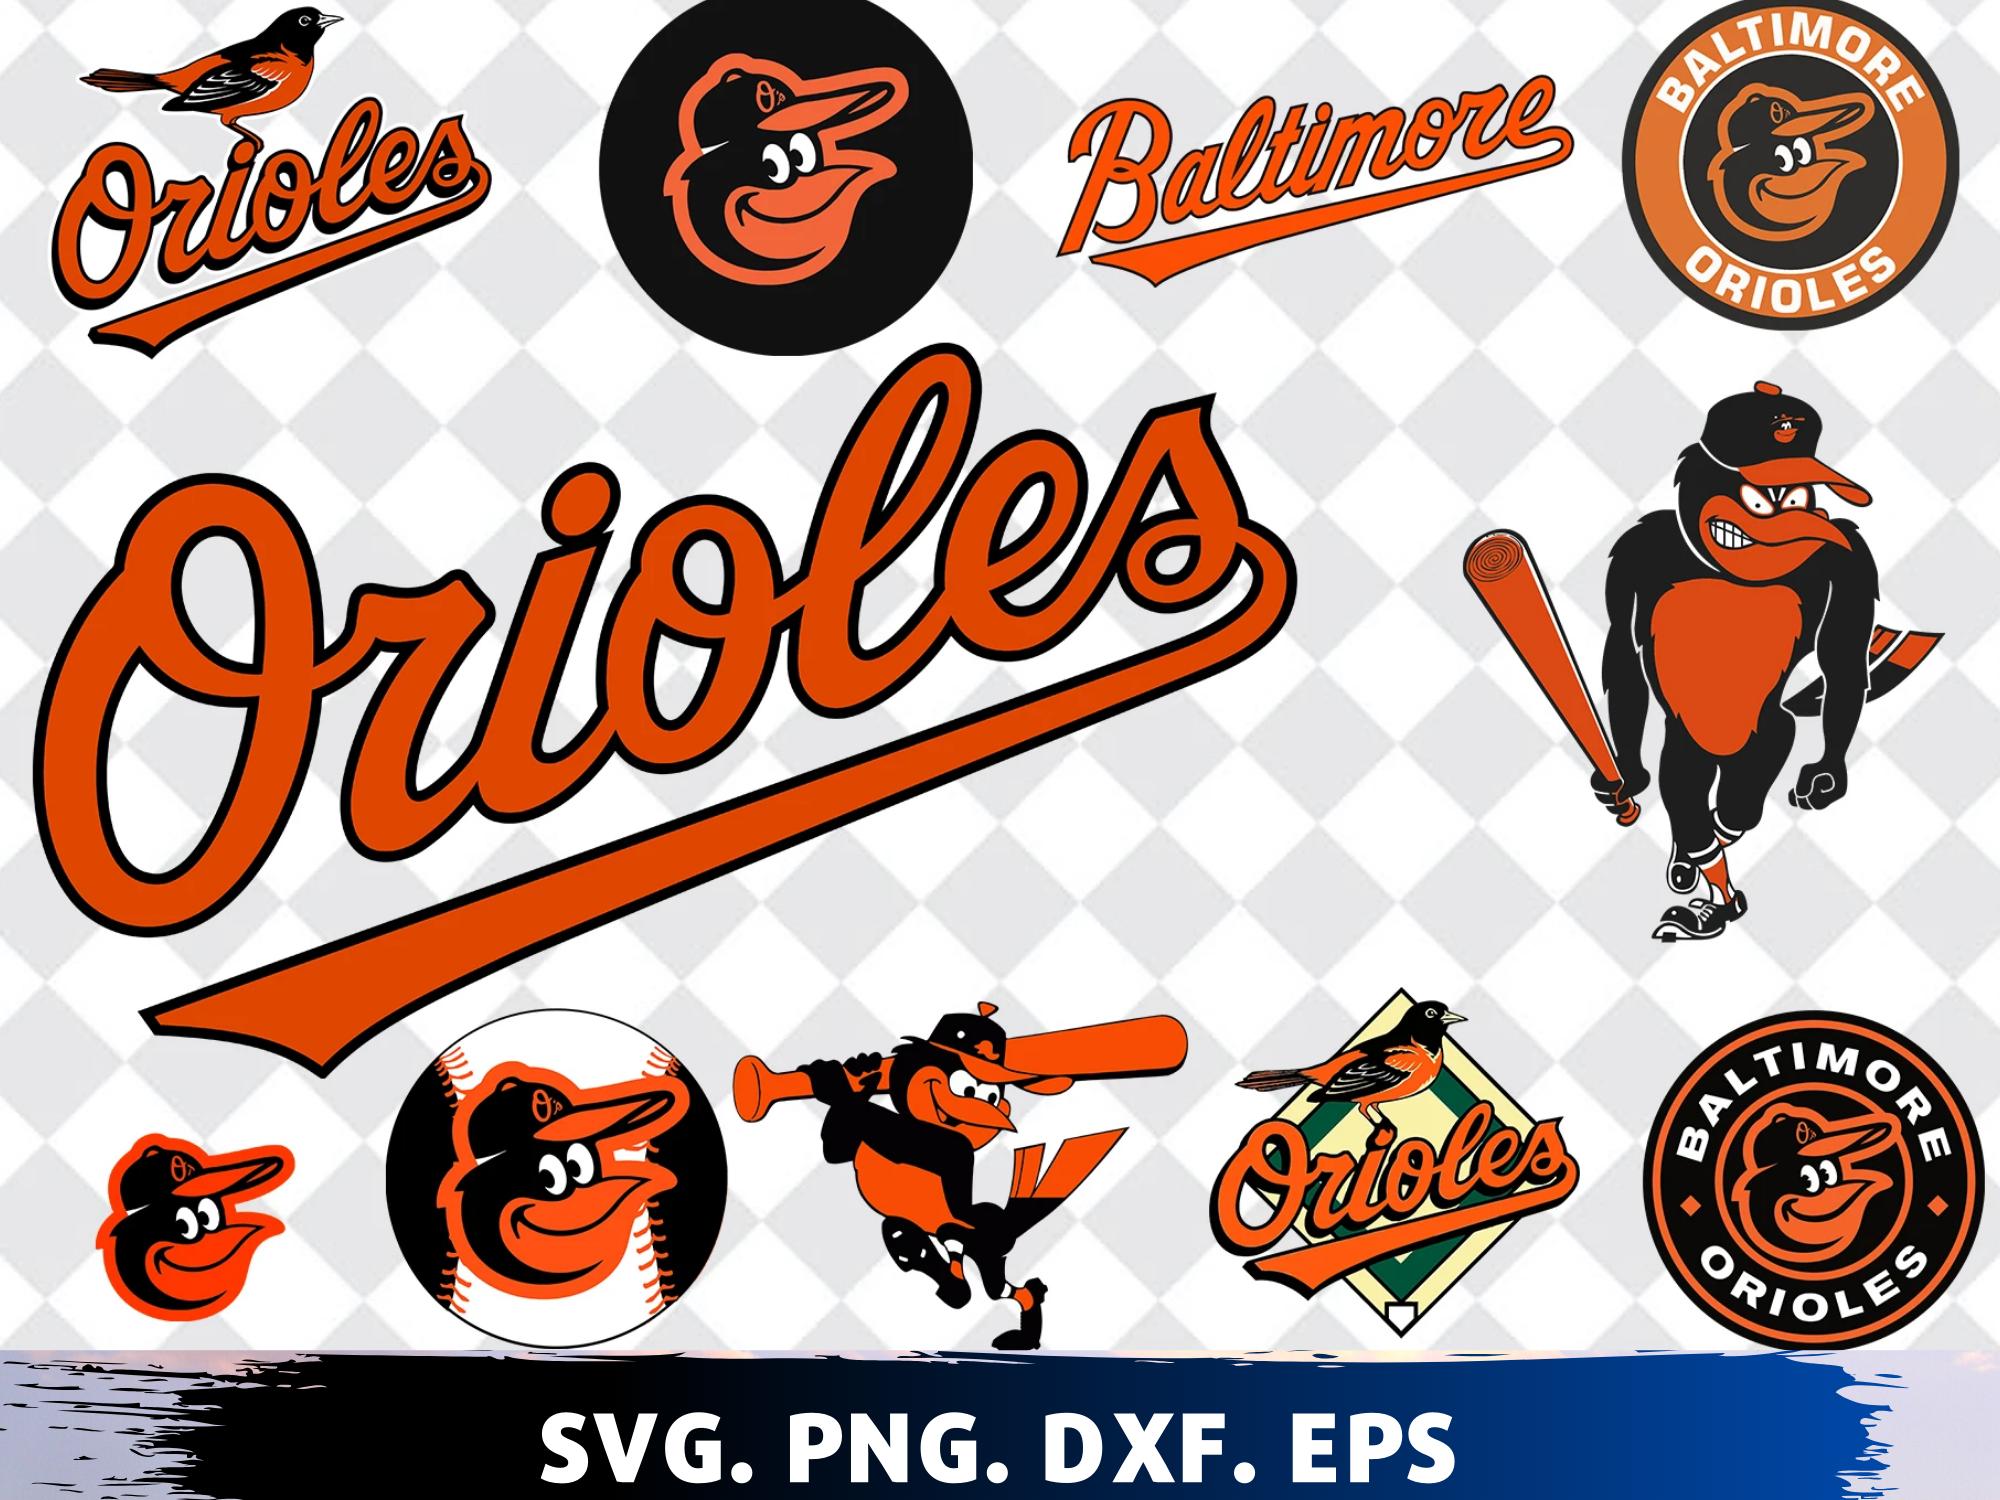 Pin By William Vanderstelt On Love Orioles Baseball Chicago Cubs Baseball Baltimore Orioles Baseball